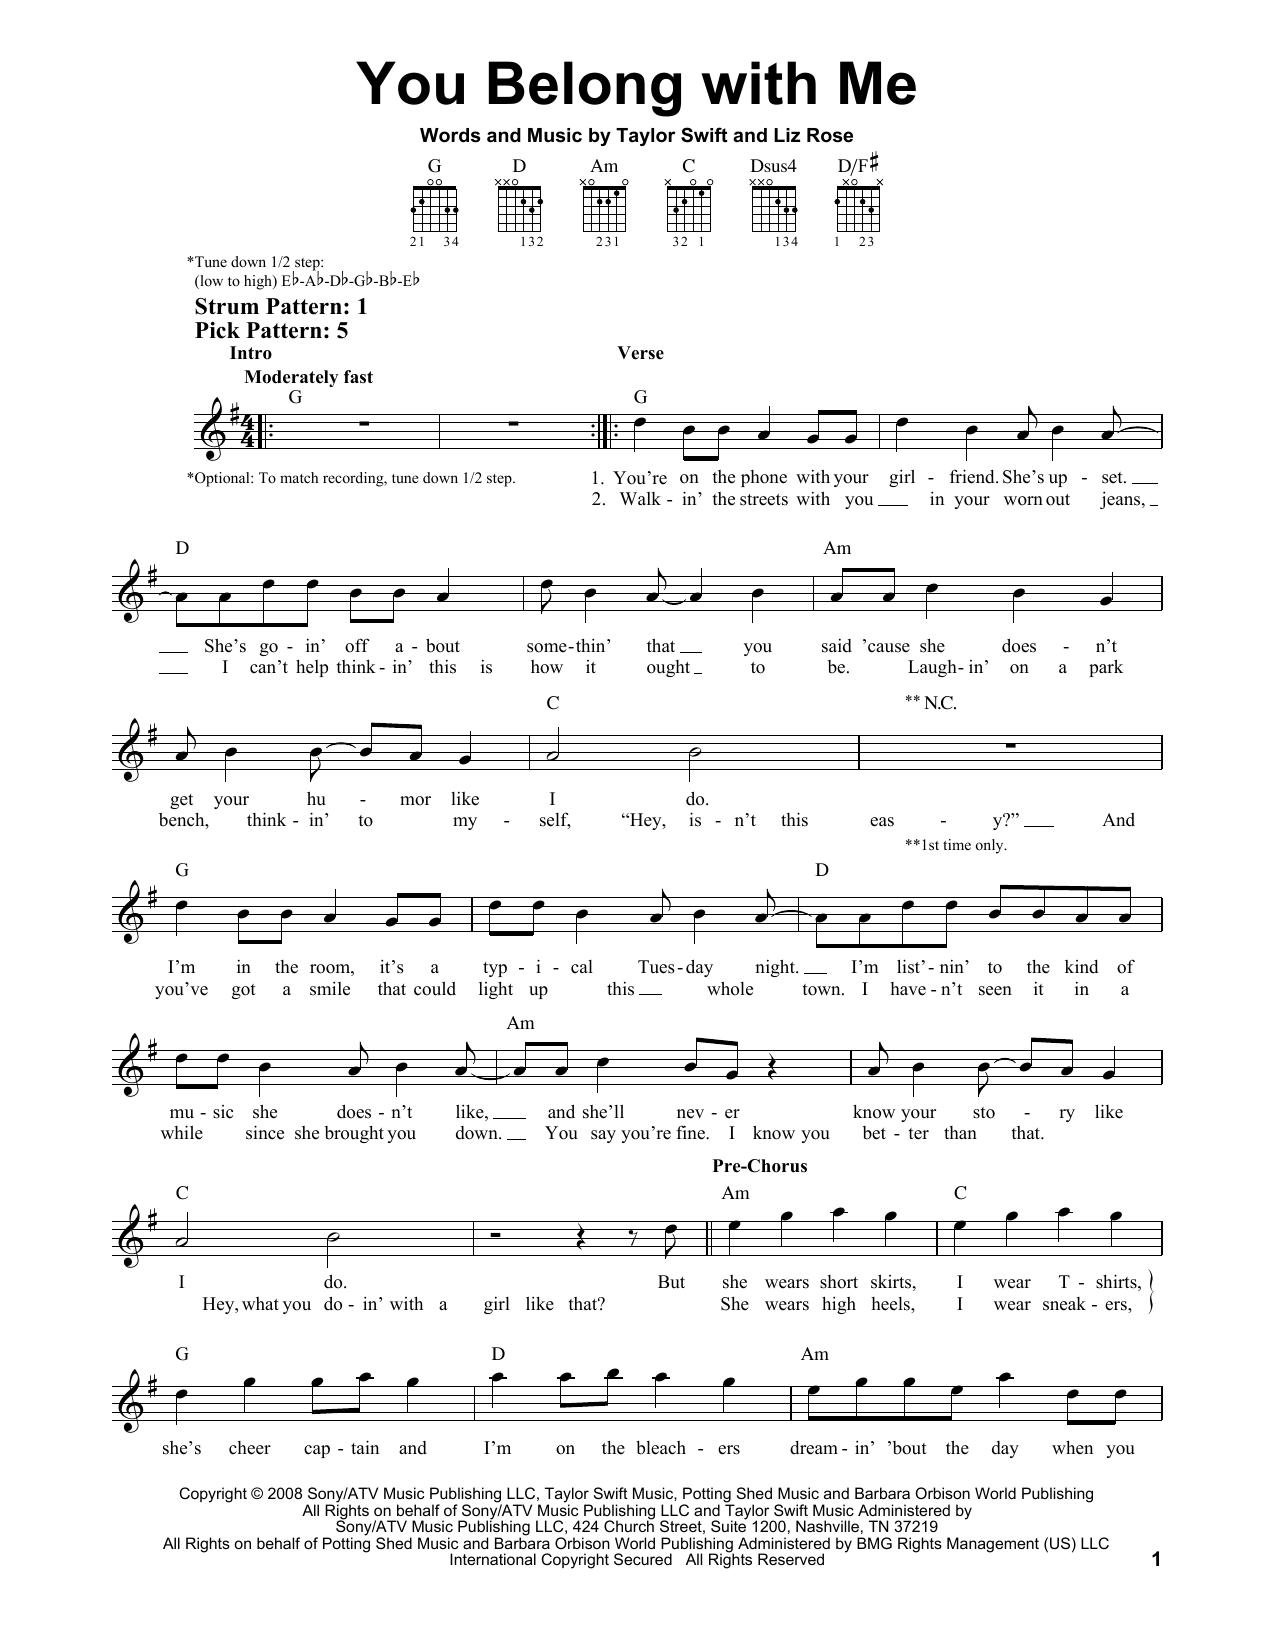 You Belong With Me Chords Sheet Music Digital Files To Print Licensed Liz Rose Digital Sheet